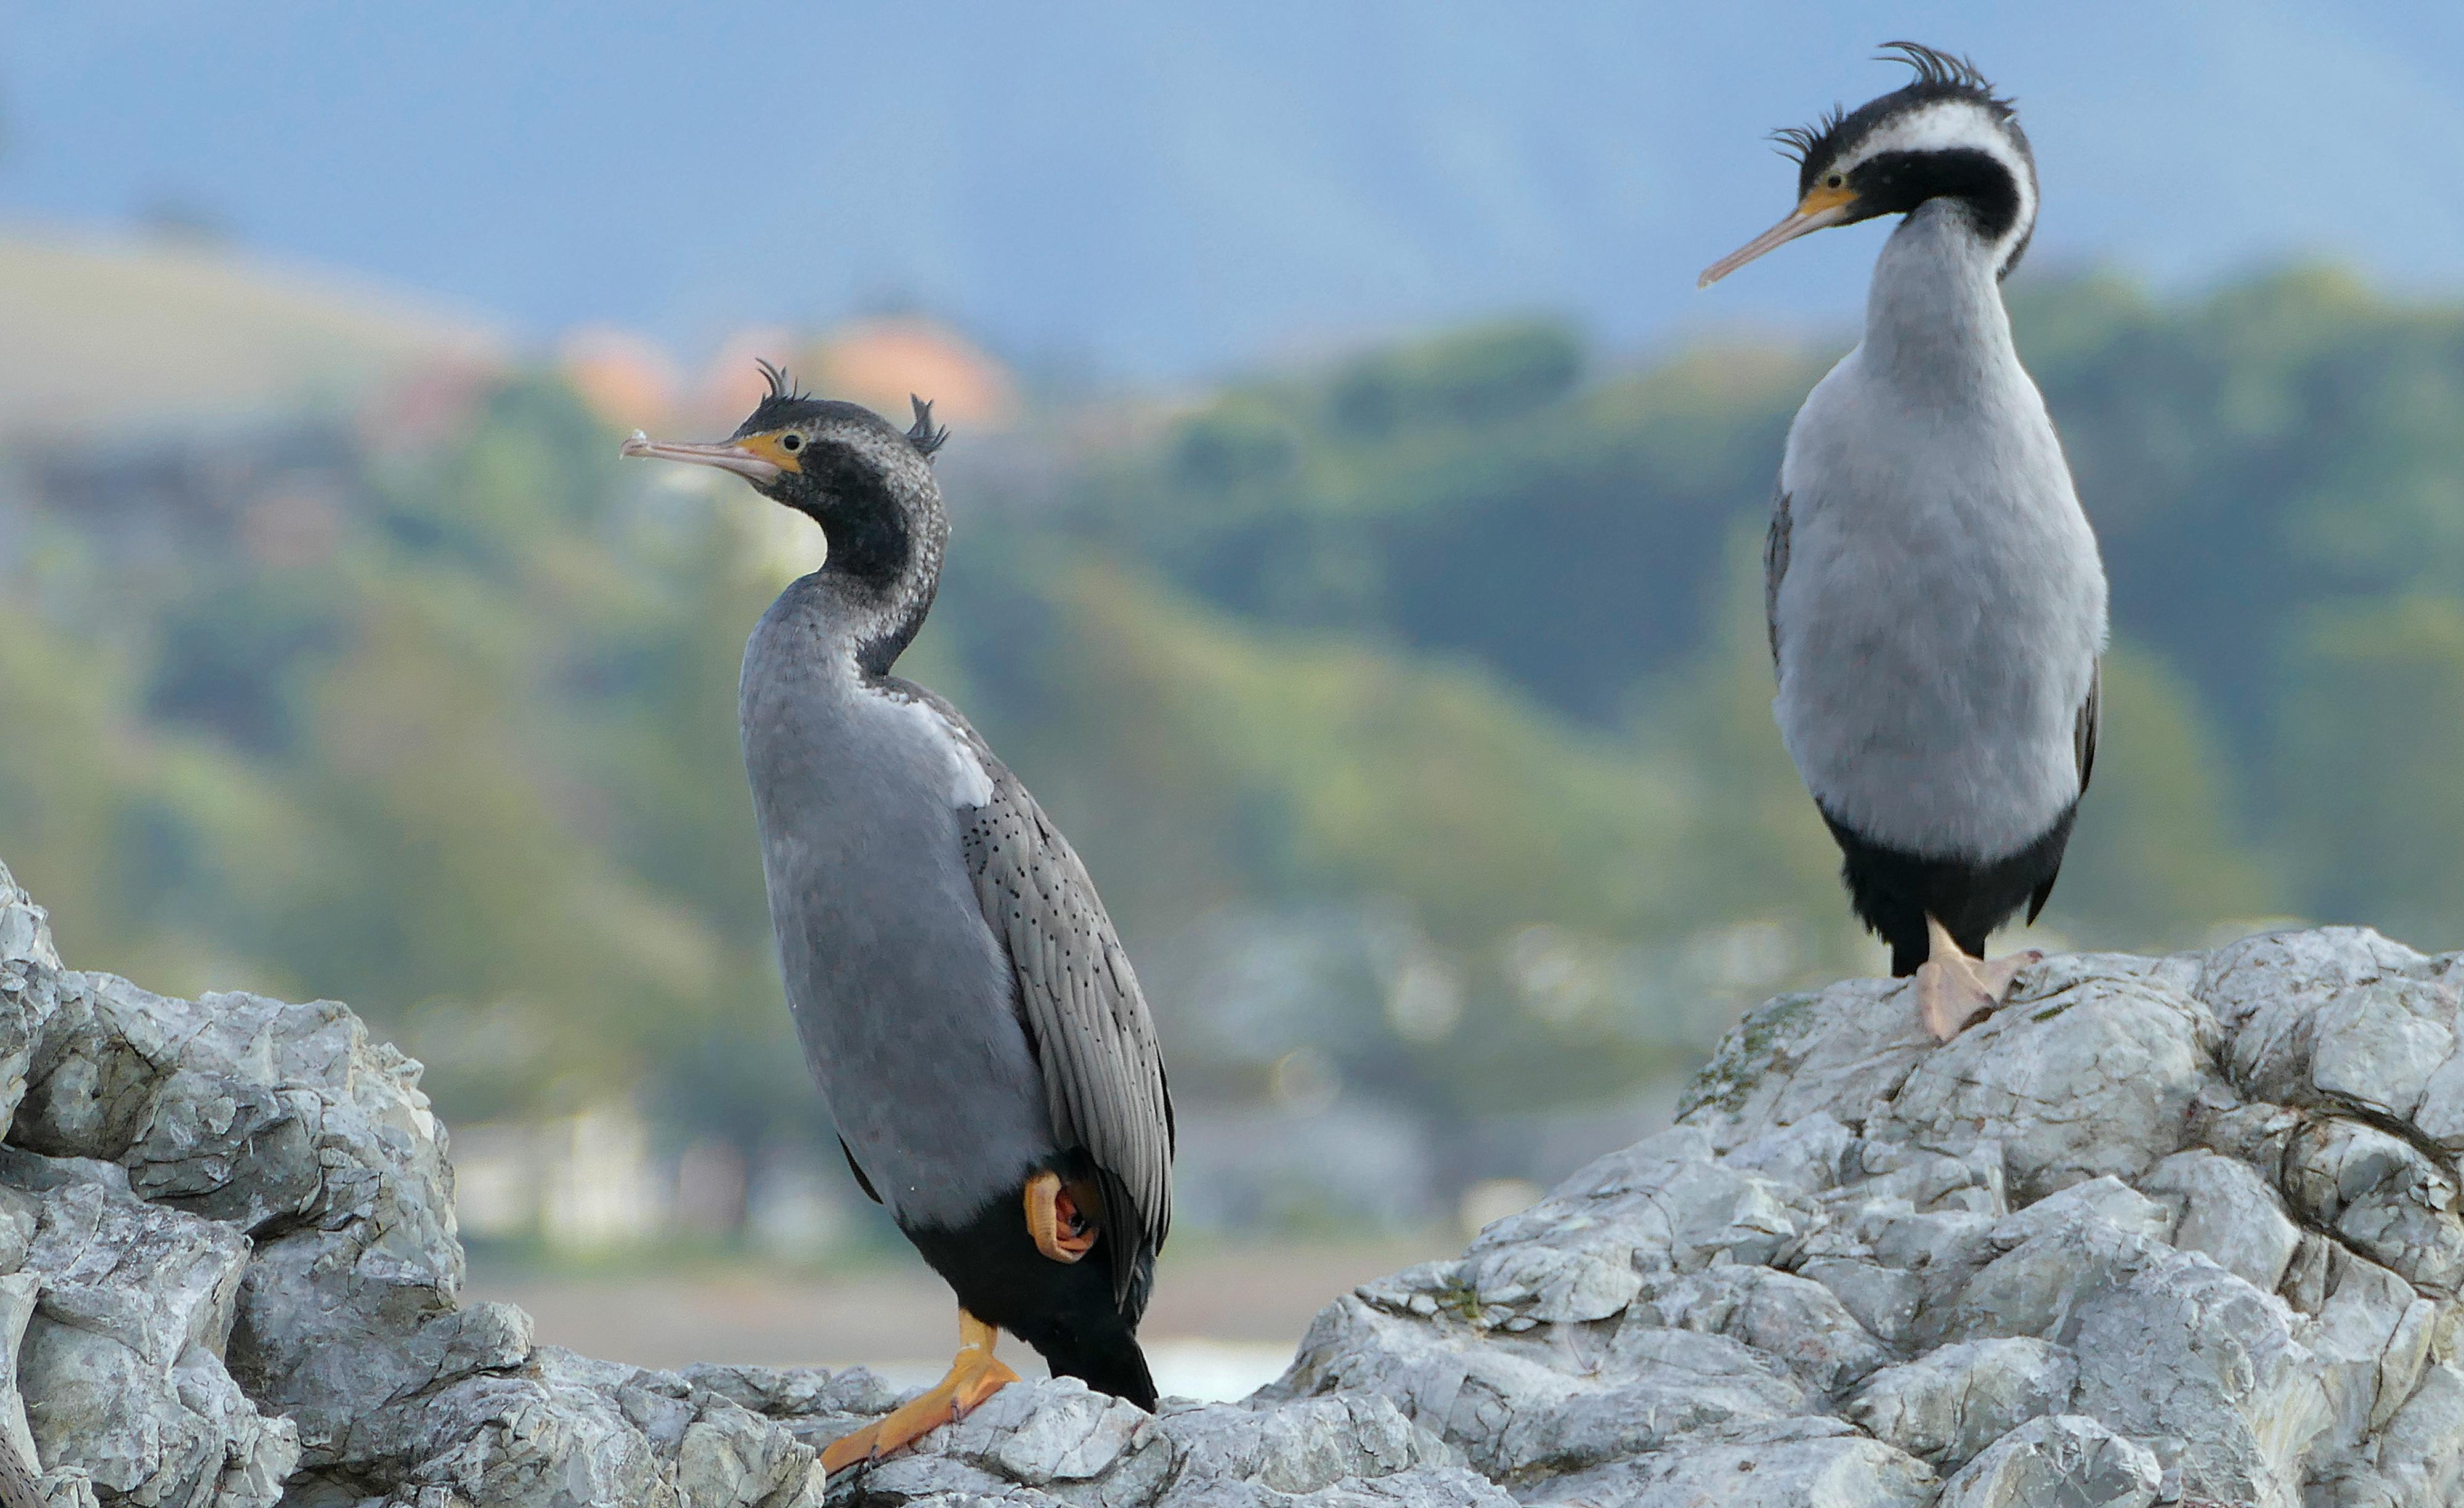 Spotted Shags. NZ, Animal, Bird, Bridge camera, Depth of field, HQ Photo